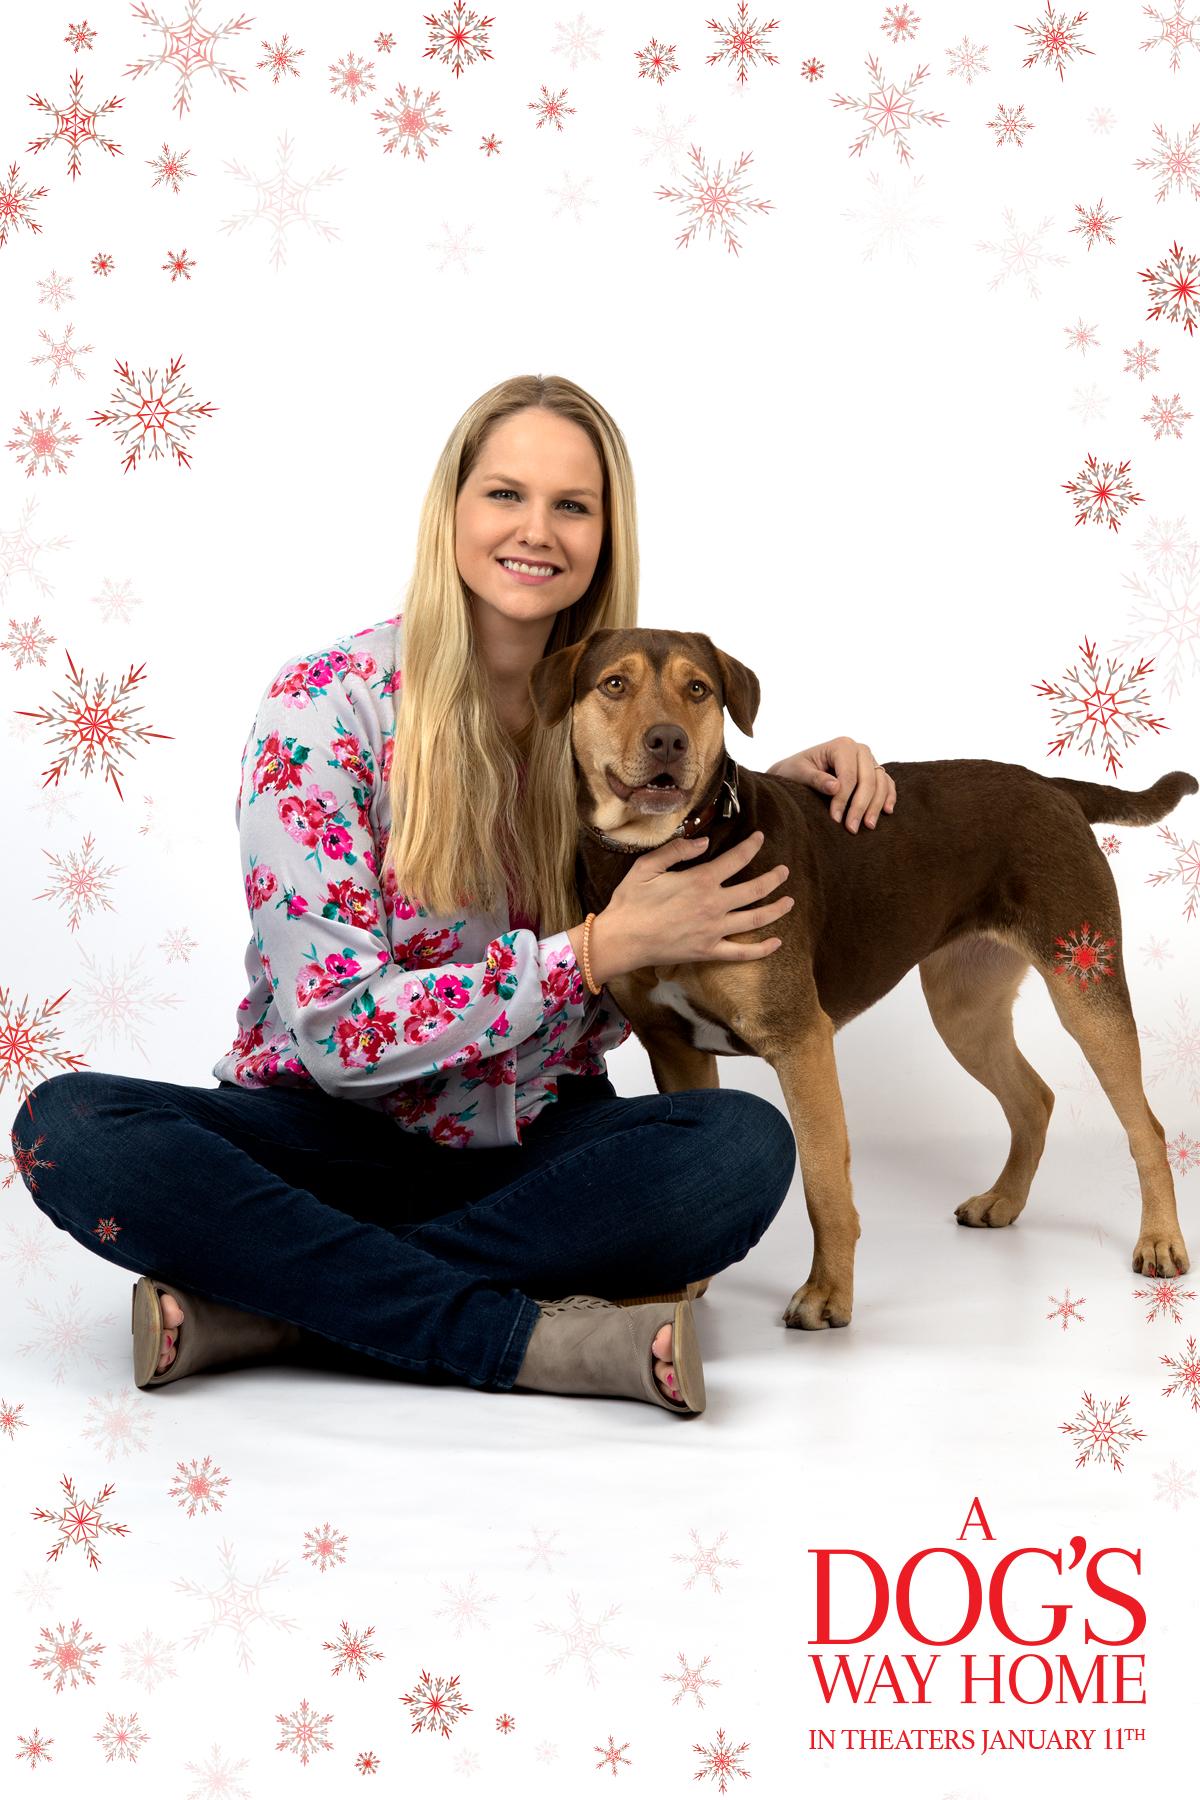 A Dogs Way_EVELYN CARROLL_Press Junket_Danielle_Spires-1524.jpg